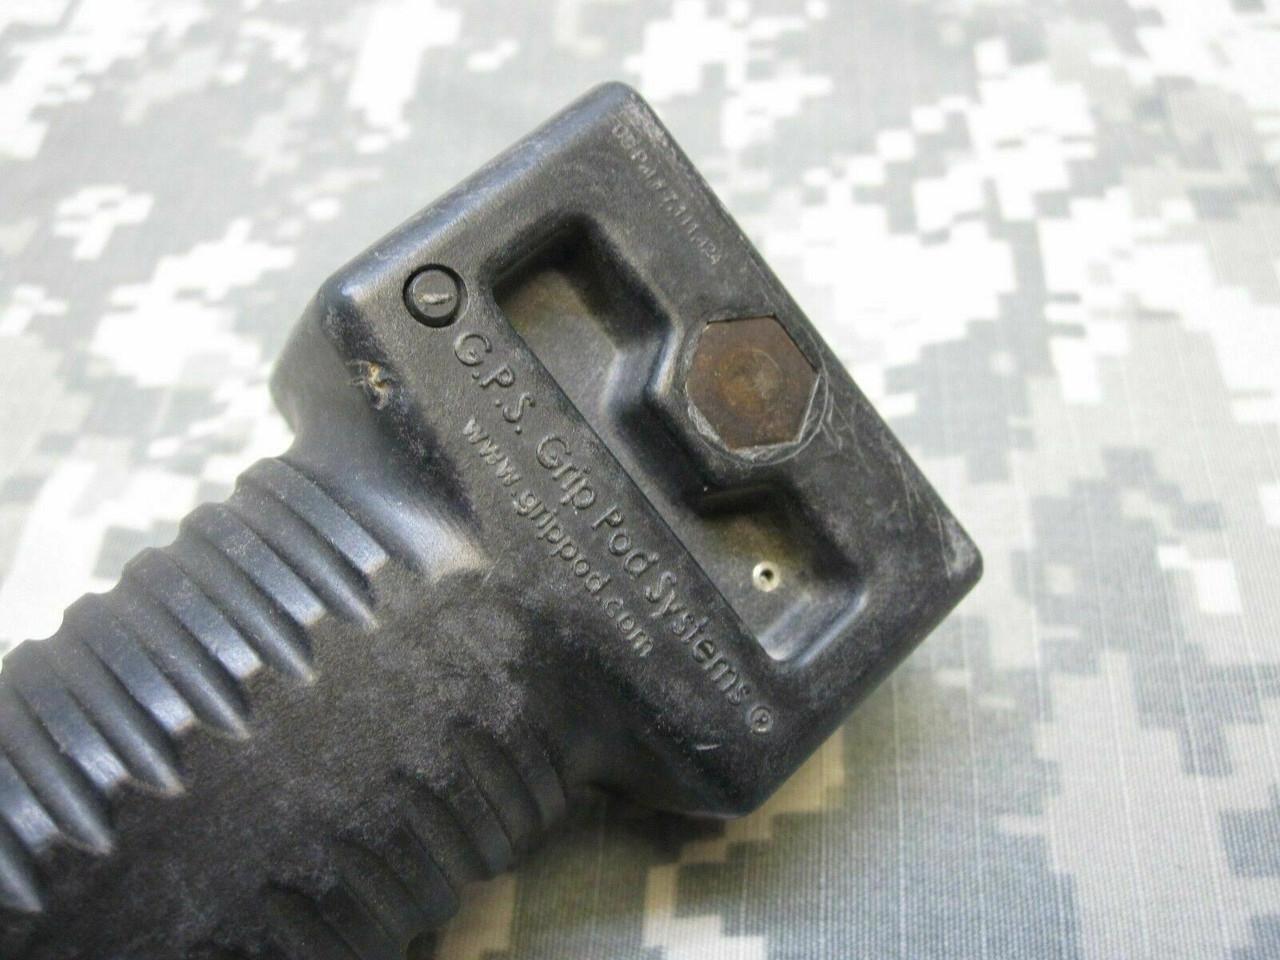 GPS-02 Polymer Picatinny Rail Grip Pod Mount Bipod Military Model